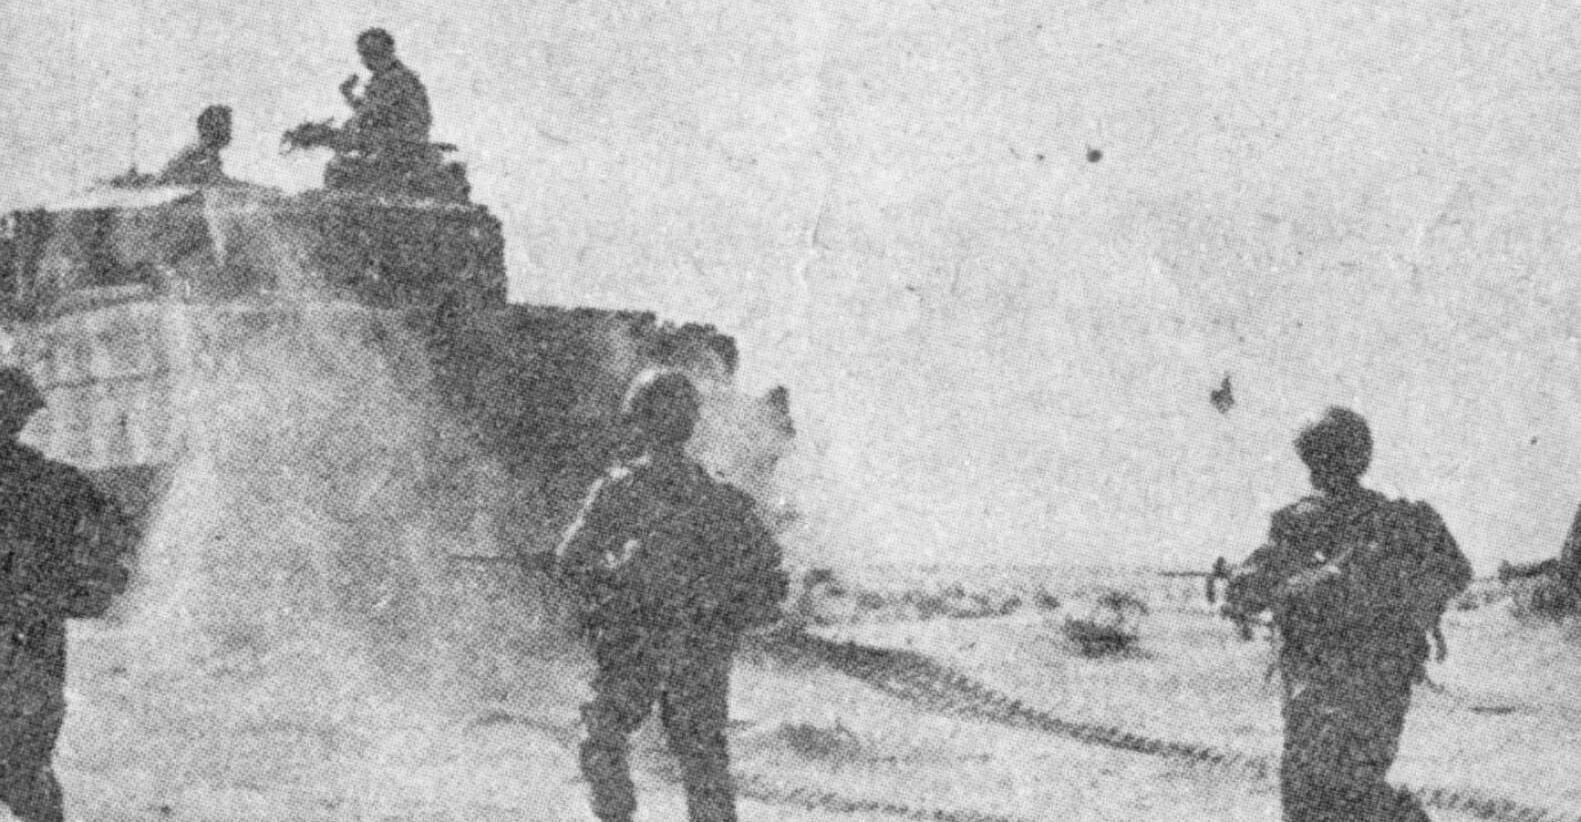 صور من حرب 5 يونيو 1967